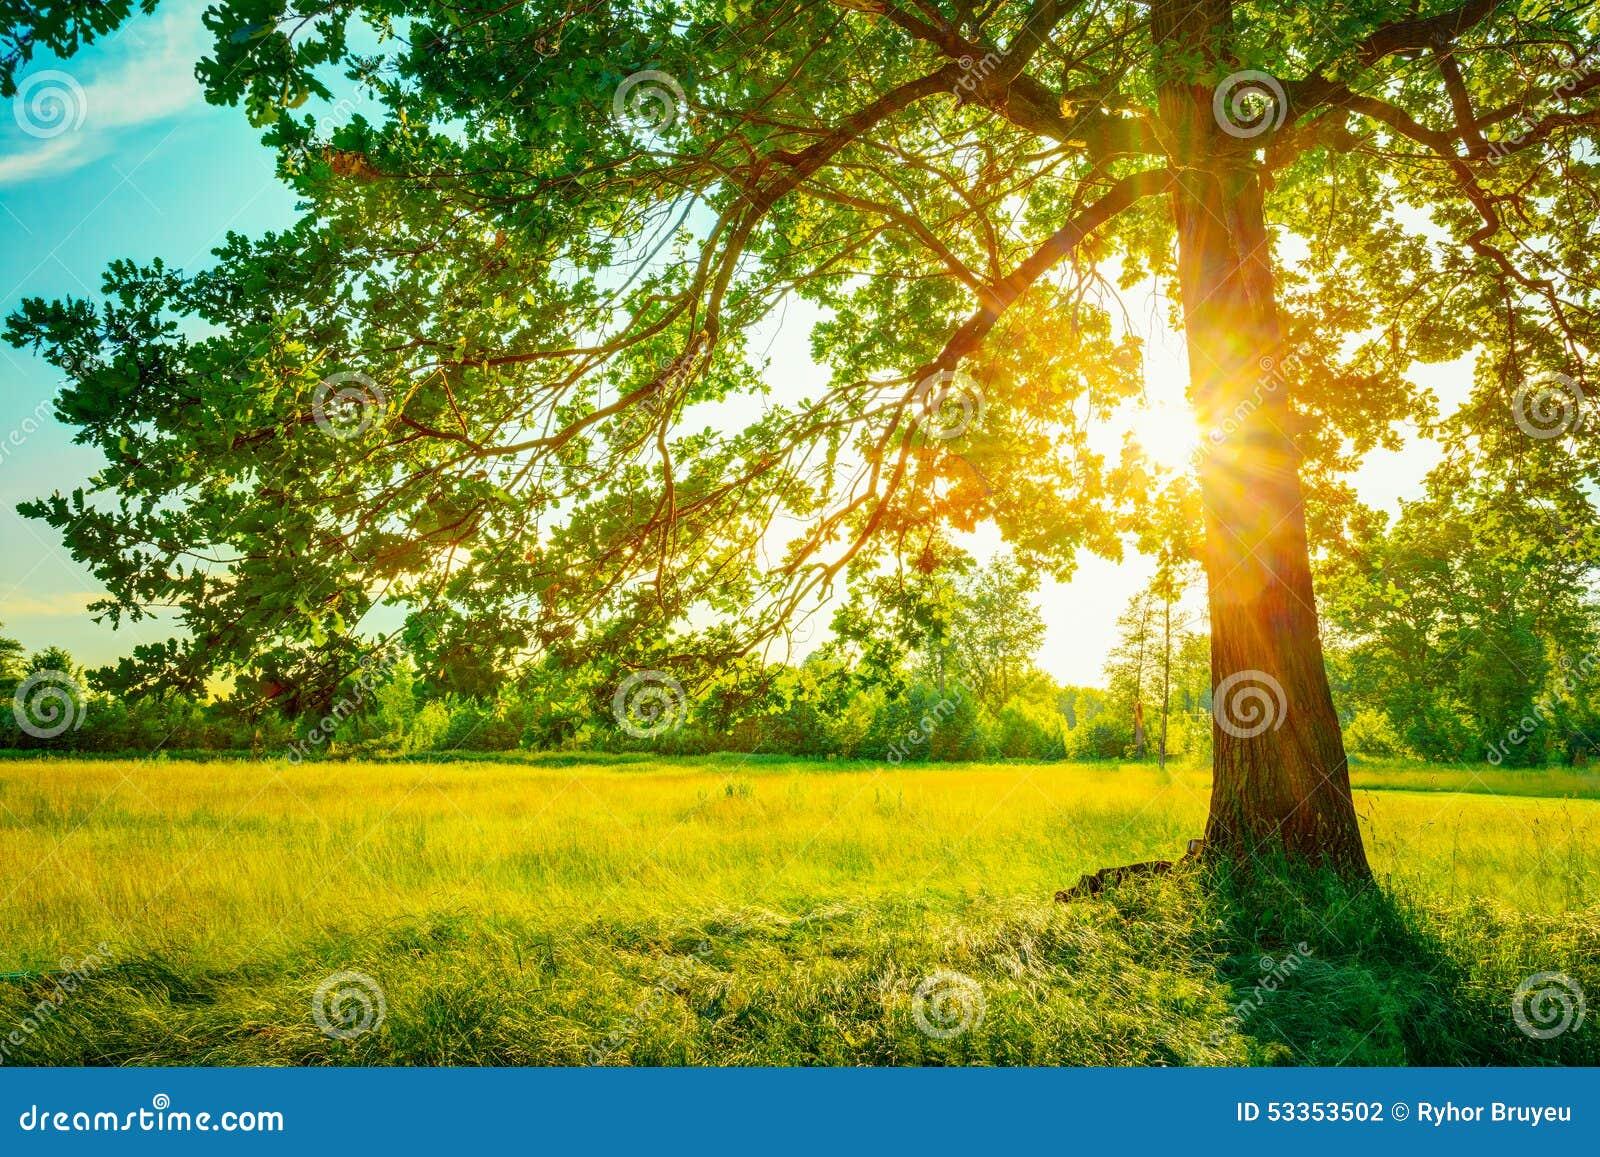 Verano Sunny Forest Trees And Green Grass Naturaleza